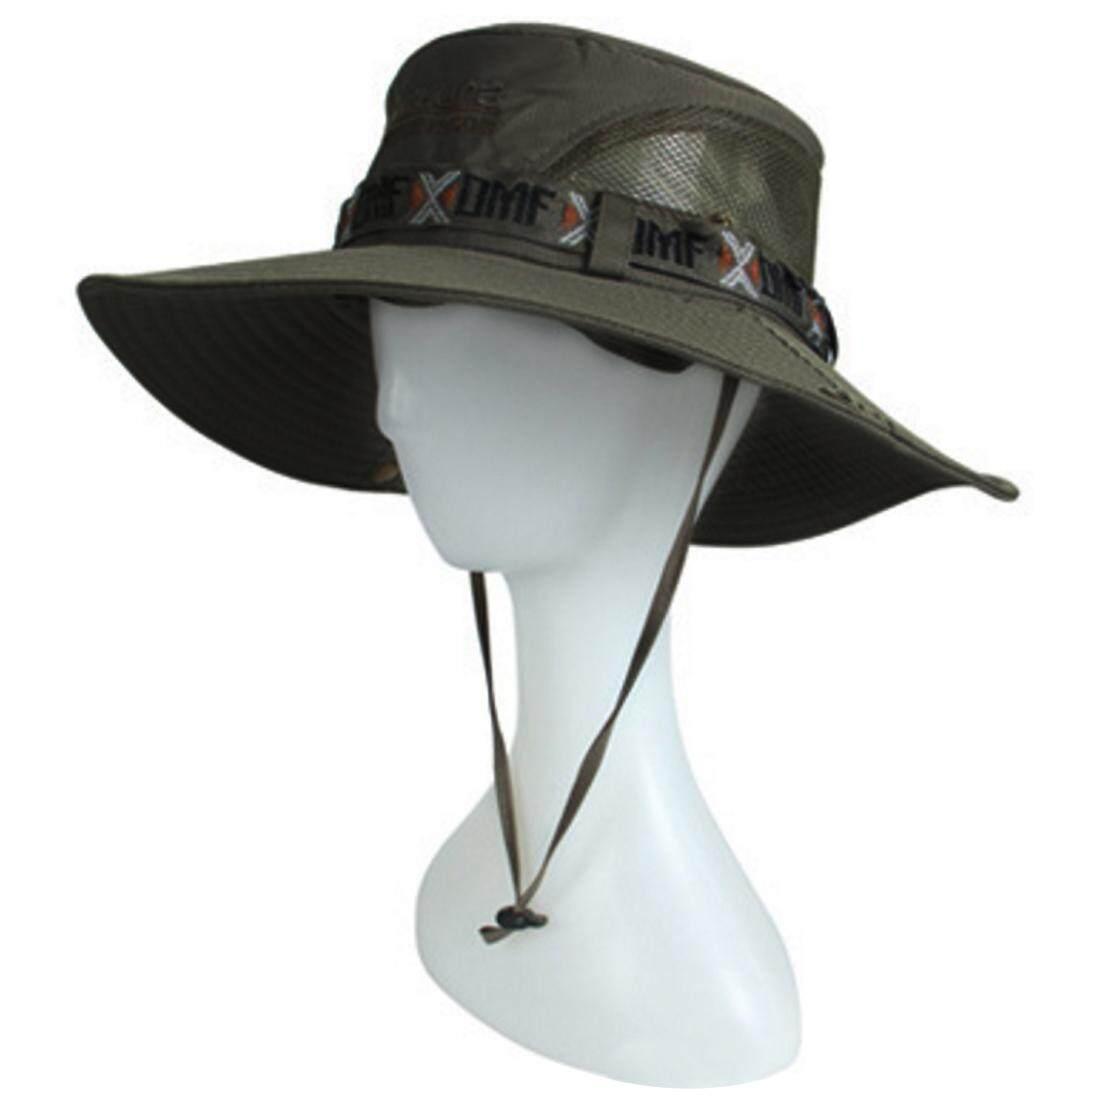 360 Ingin Orang Topi Pantai Topi Pelindung untuk Musim Panas Berburu Memancing Di Luar Ruangan Gurun